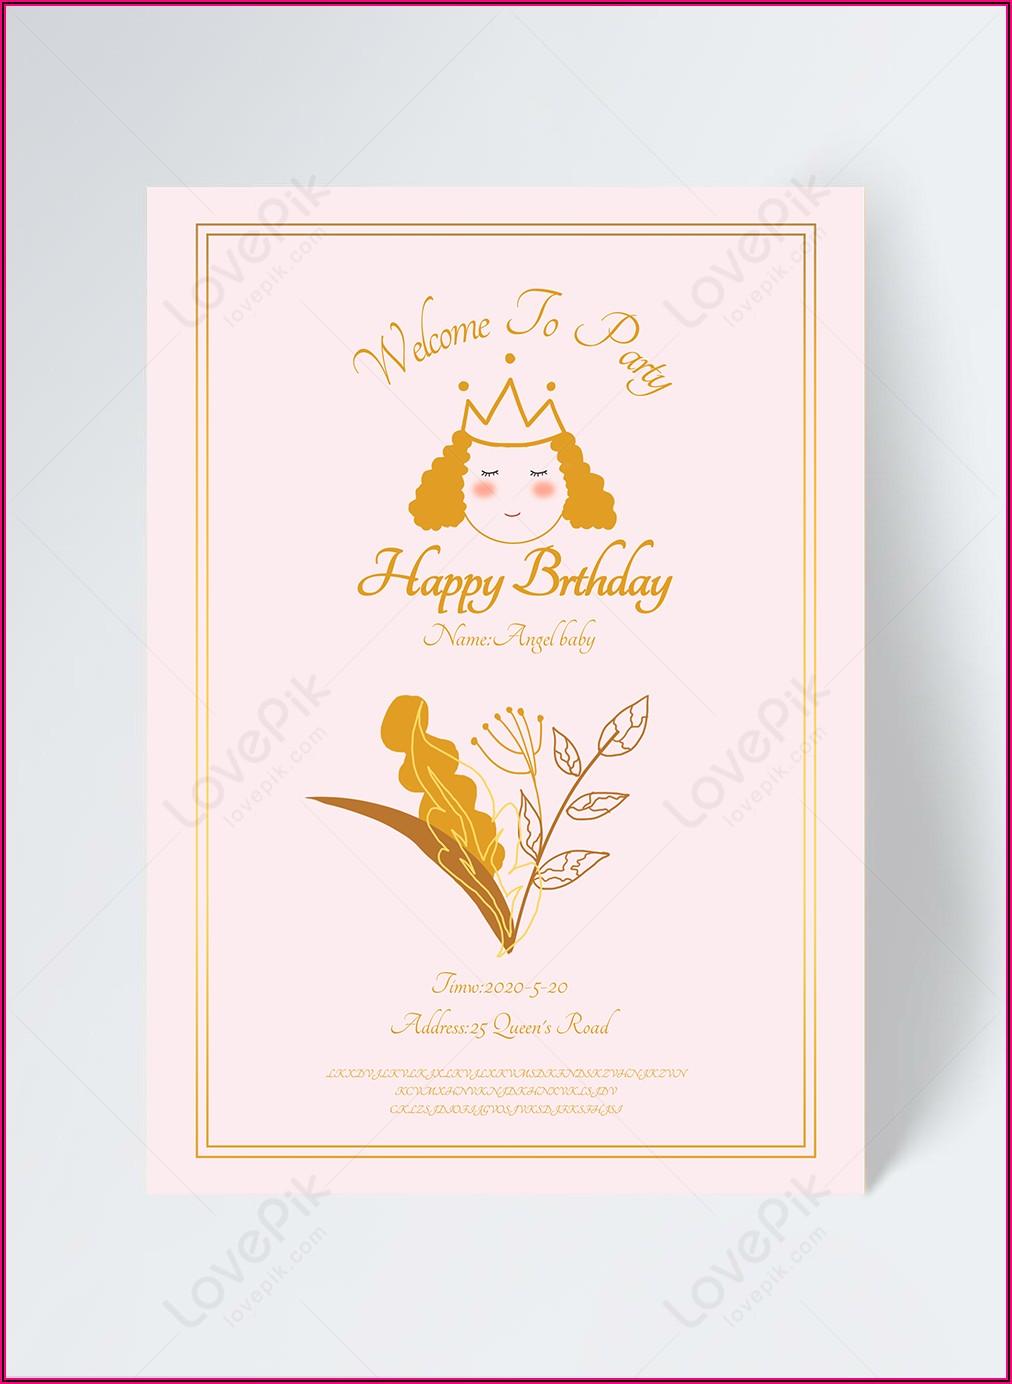 Princess Birthday Invitation Template Free Download